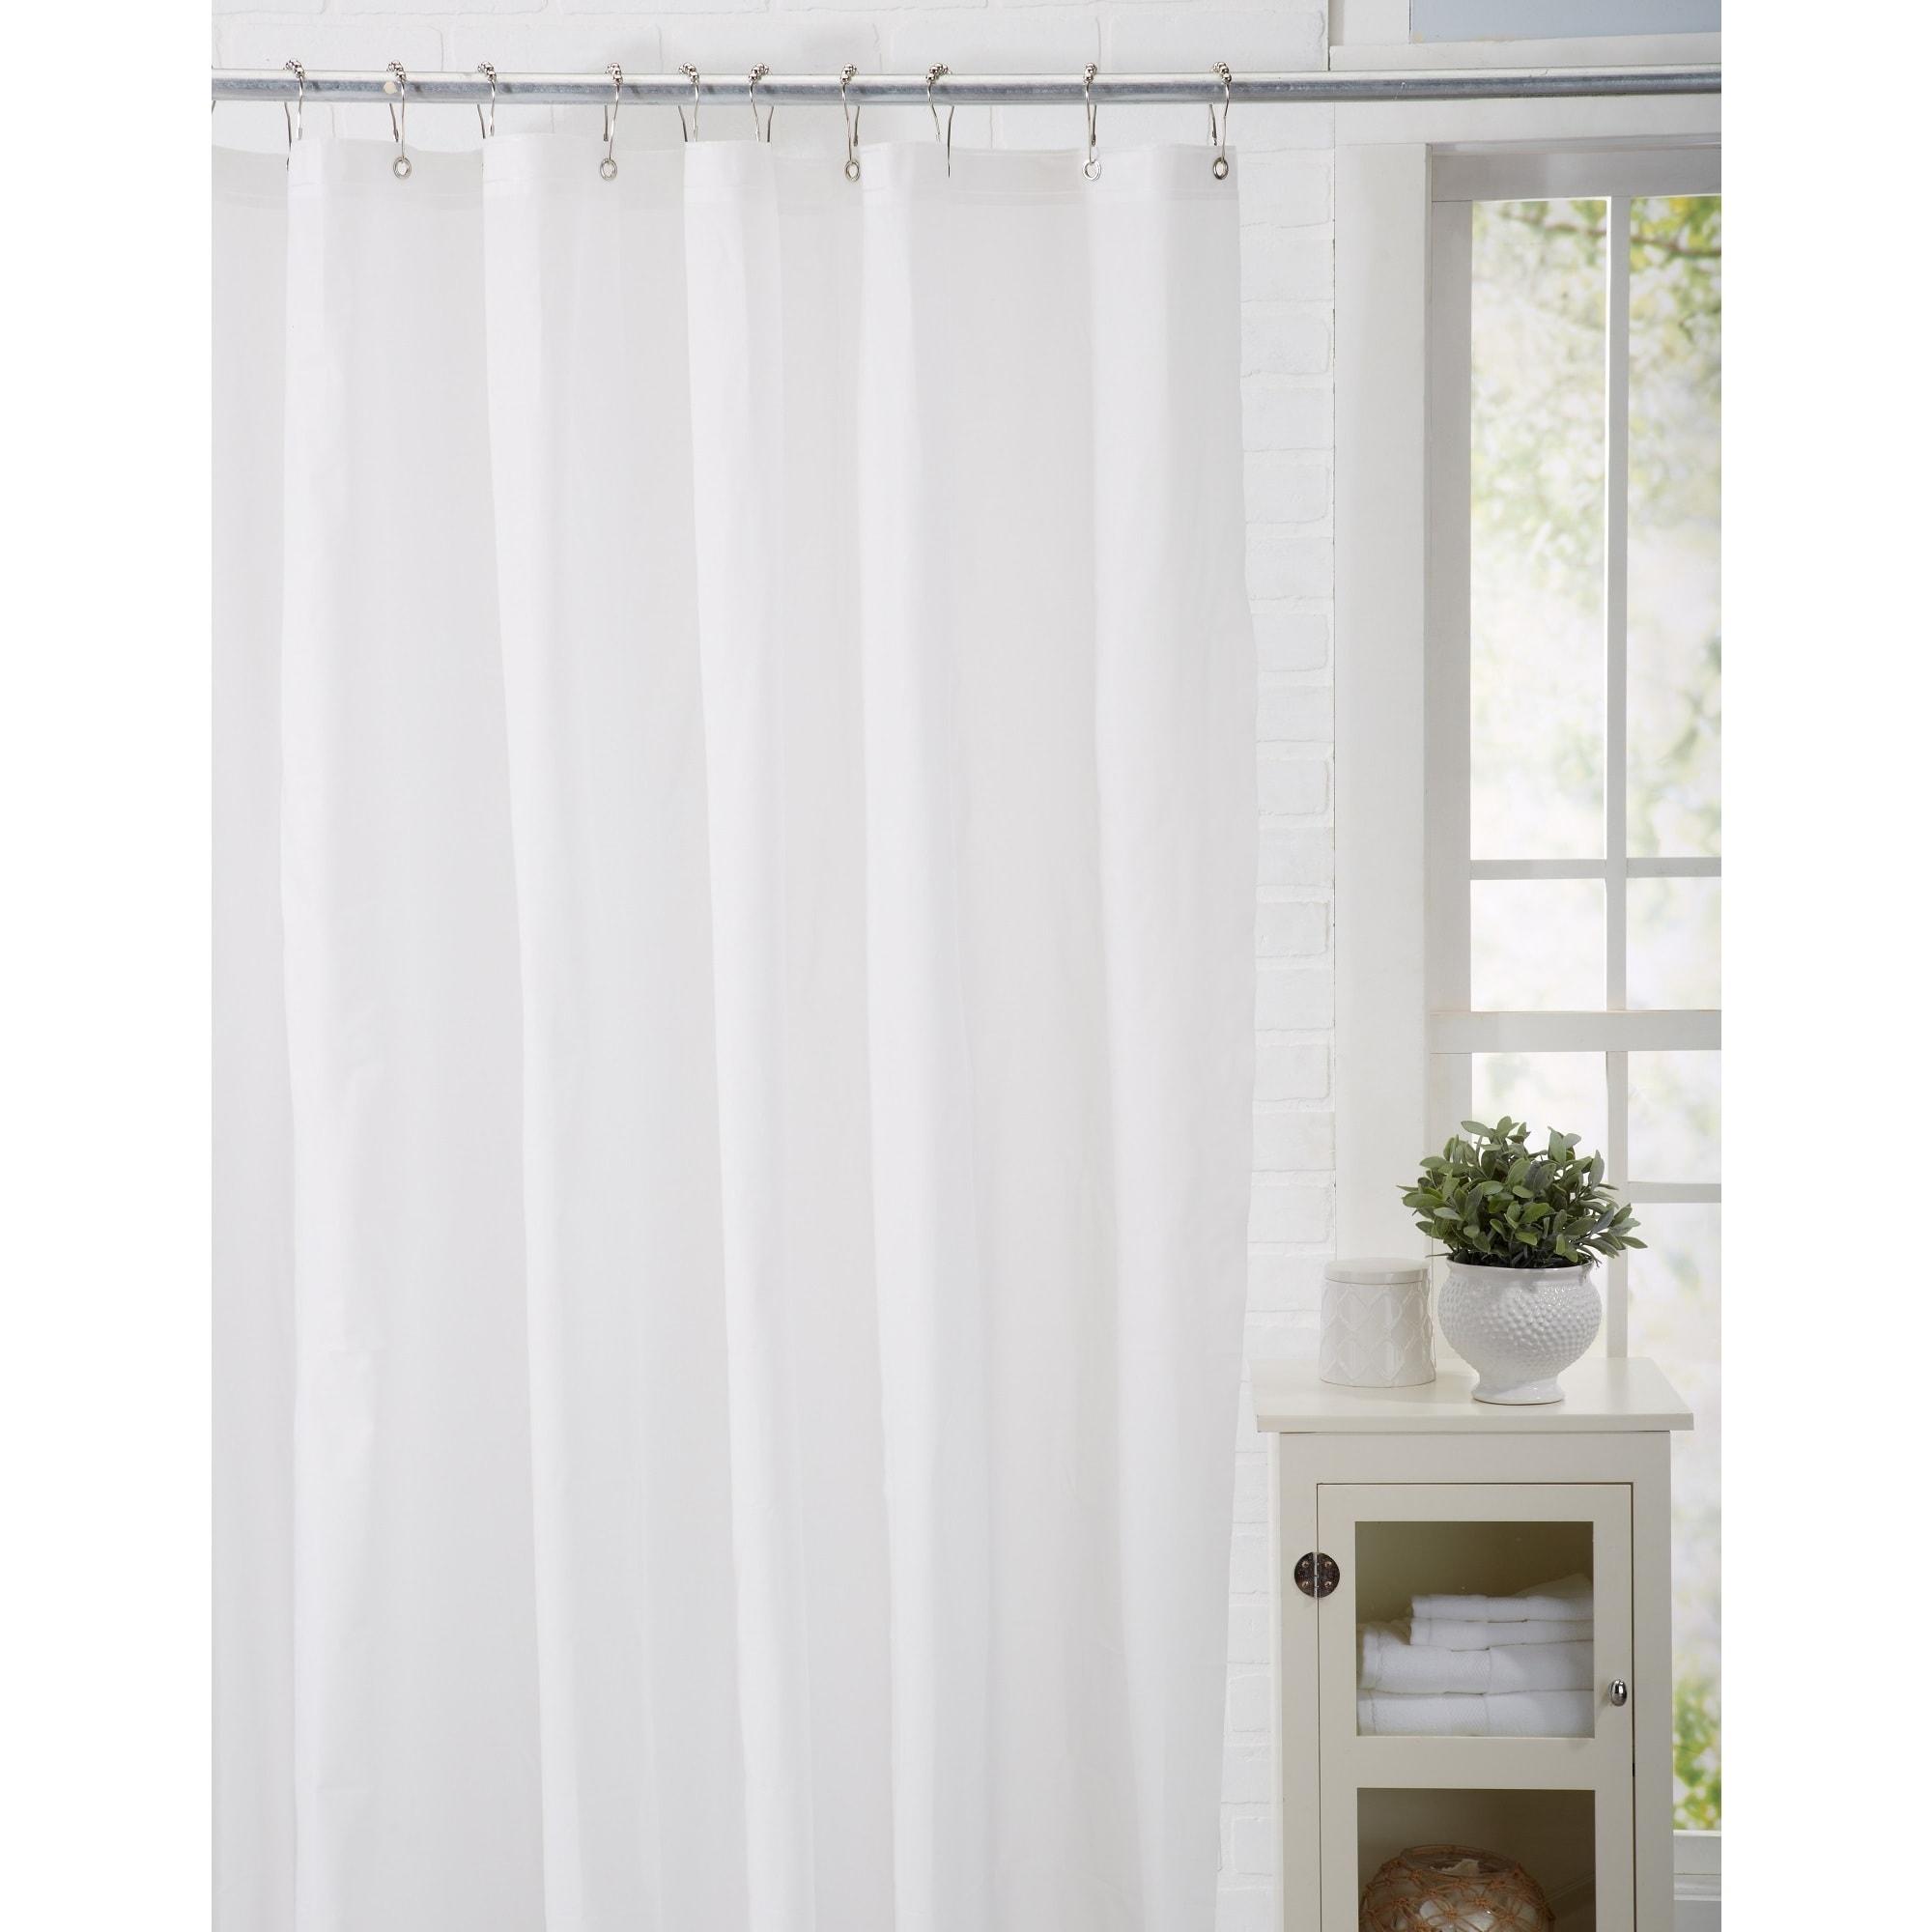 Shop Home Fashion Designs Peva 70x72 Shower Curtain Liner On Sale